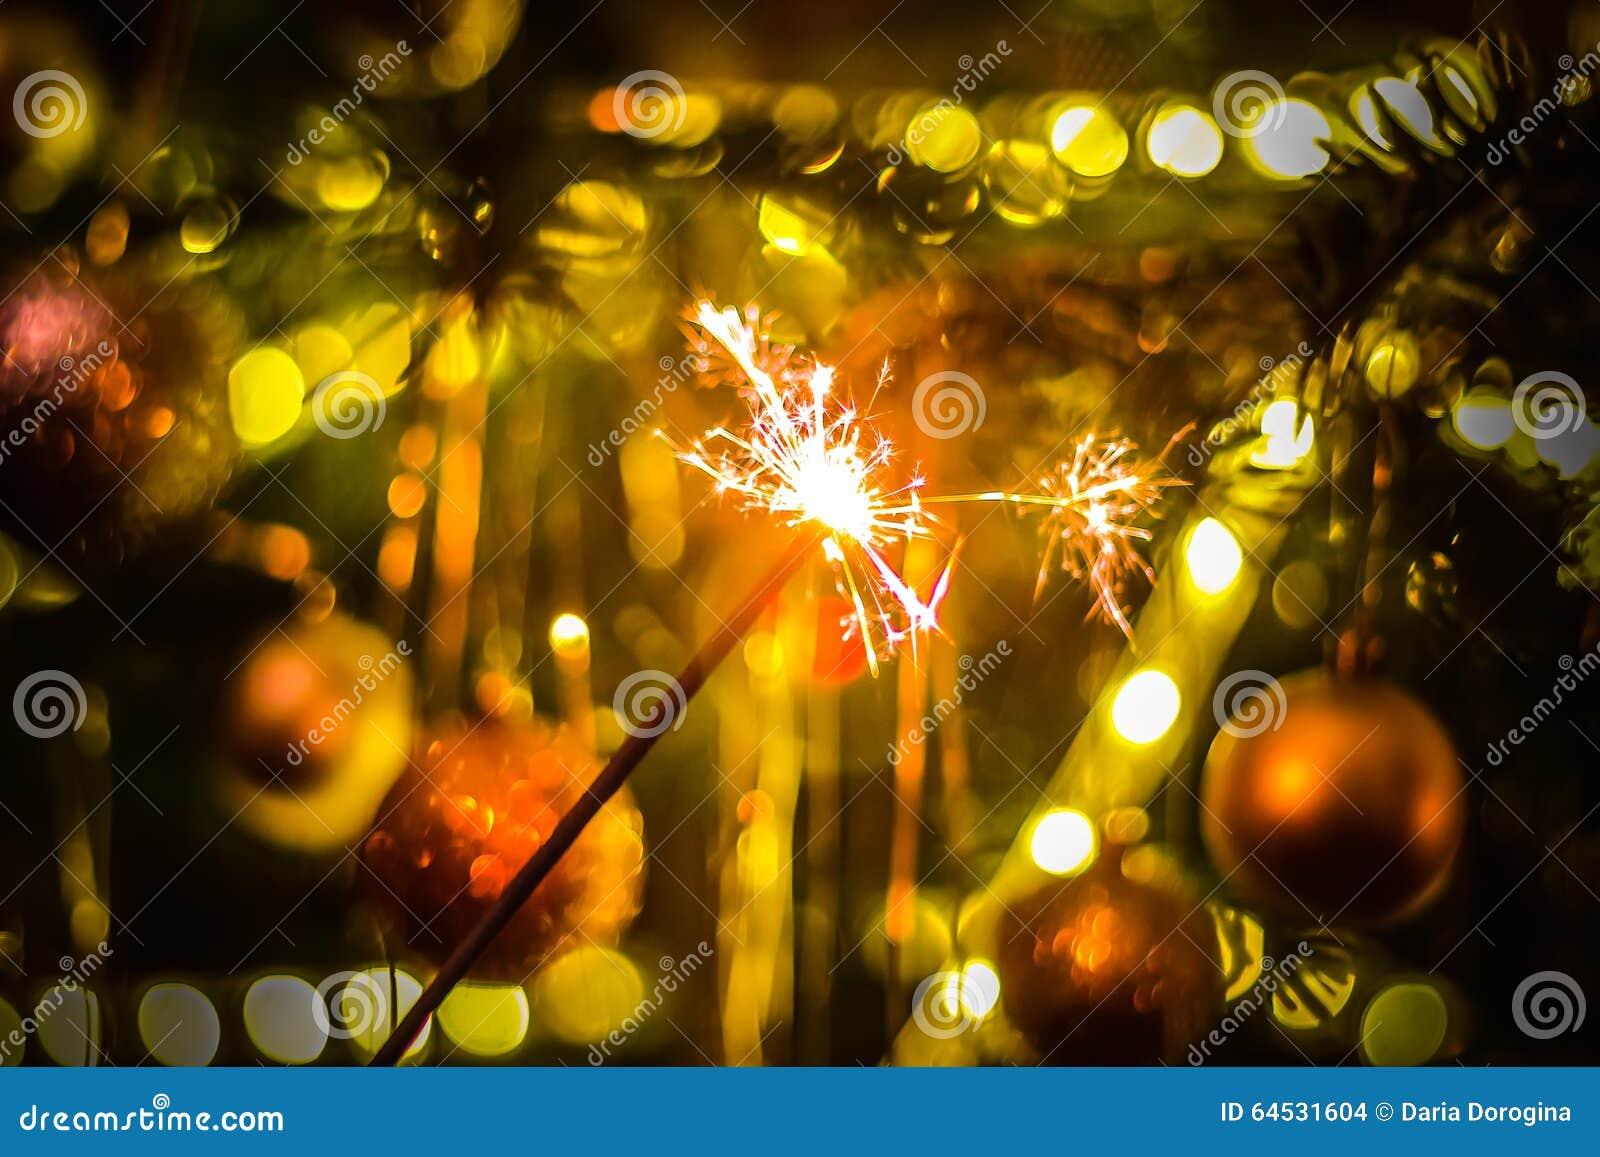 new year party sparkler sparkler on bokeh background christmas theme